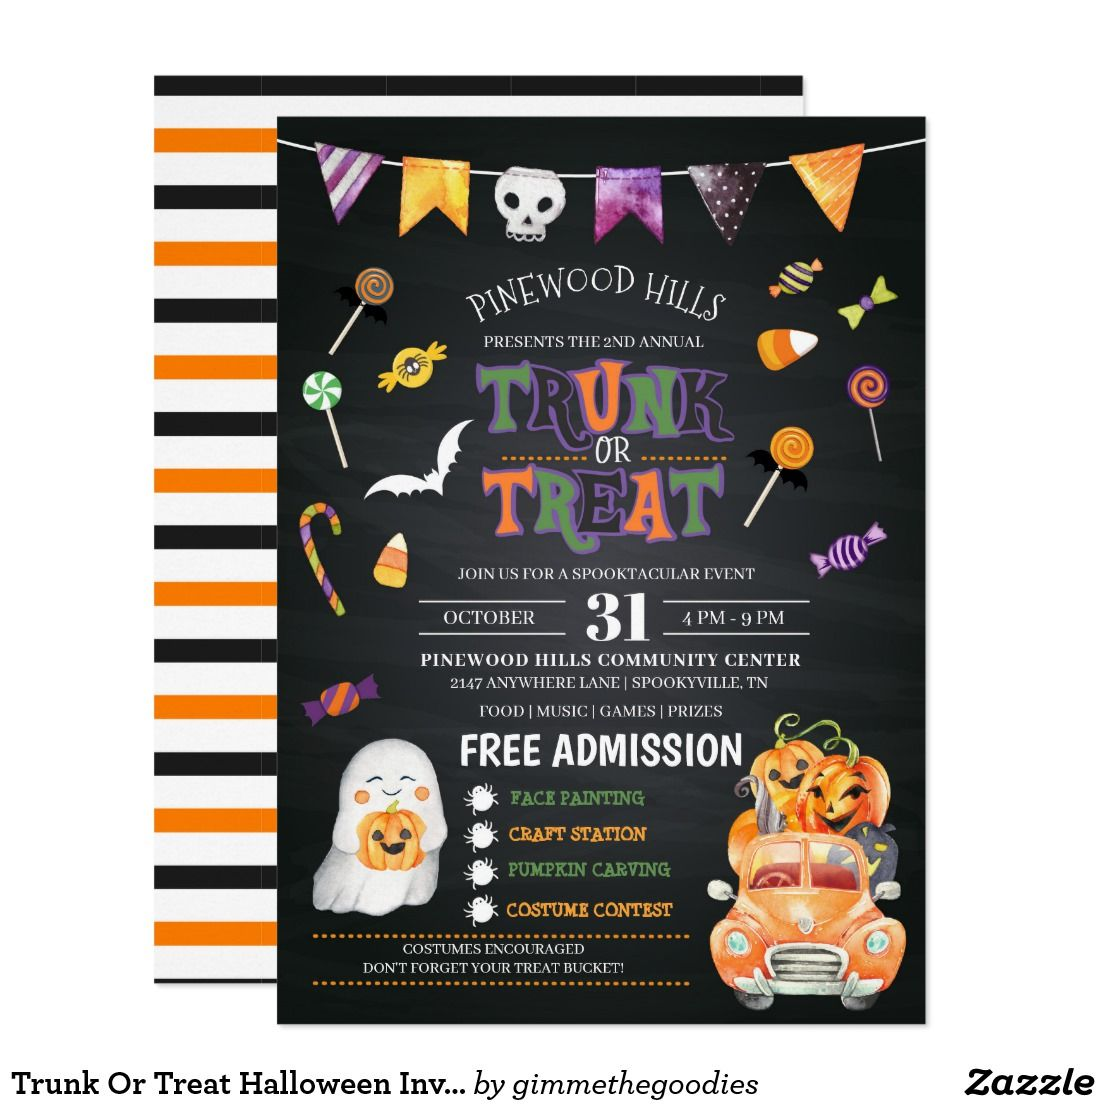 Trunk Or Treat Halloween Invitation